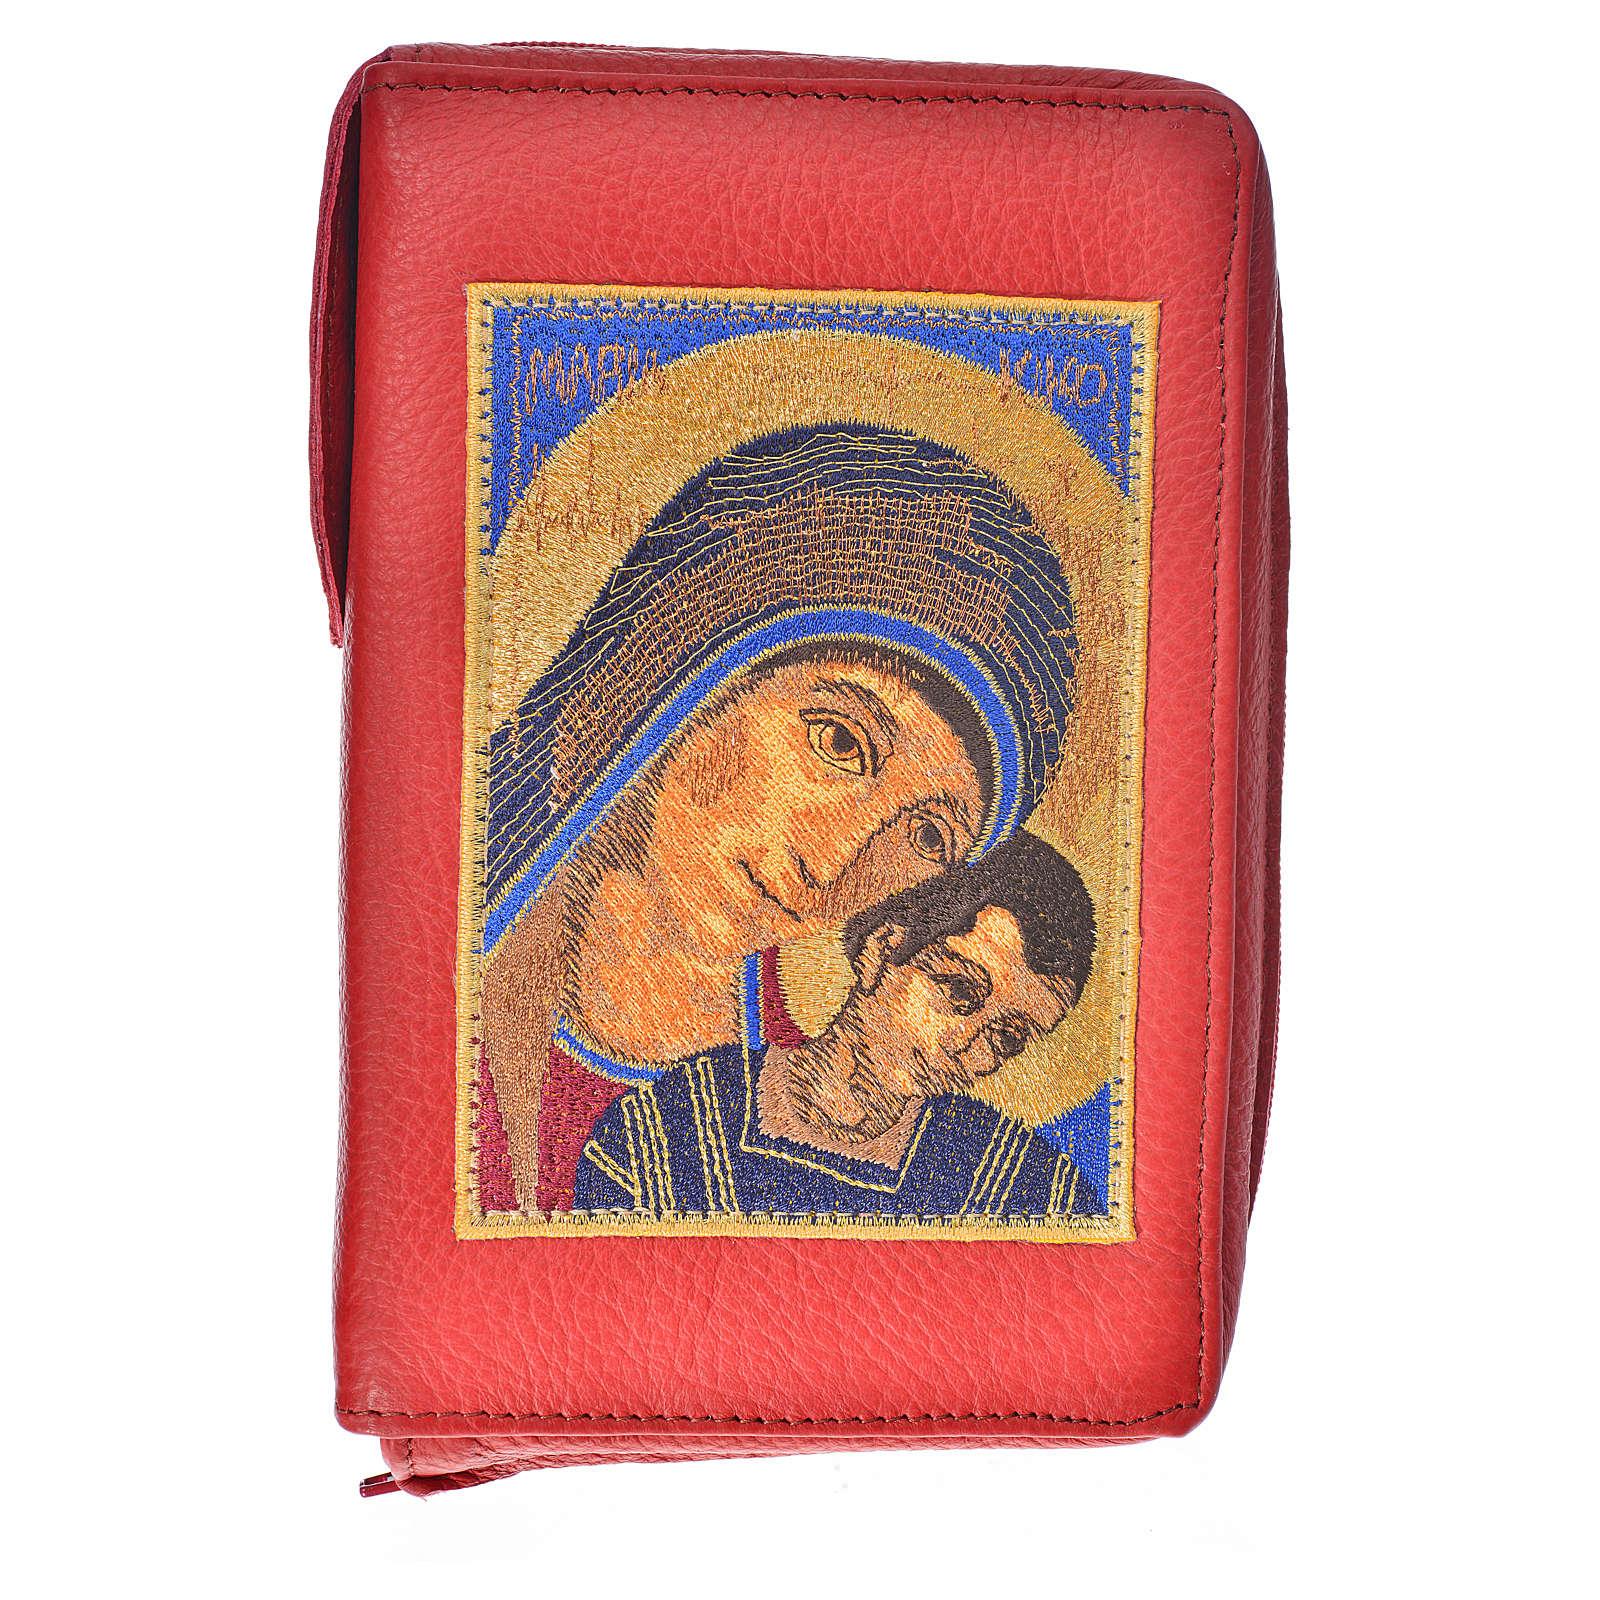 Funda Sagrada Biblia CEE ED. Pop. burdeos cuero Virgen Kiko 4